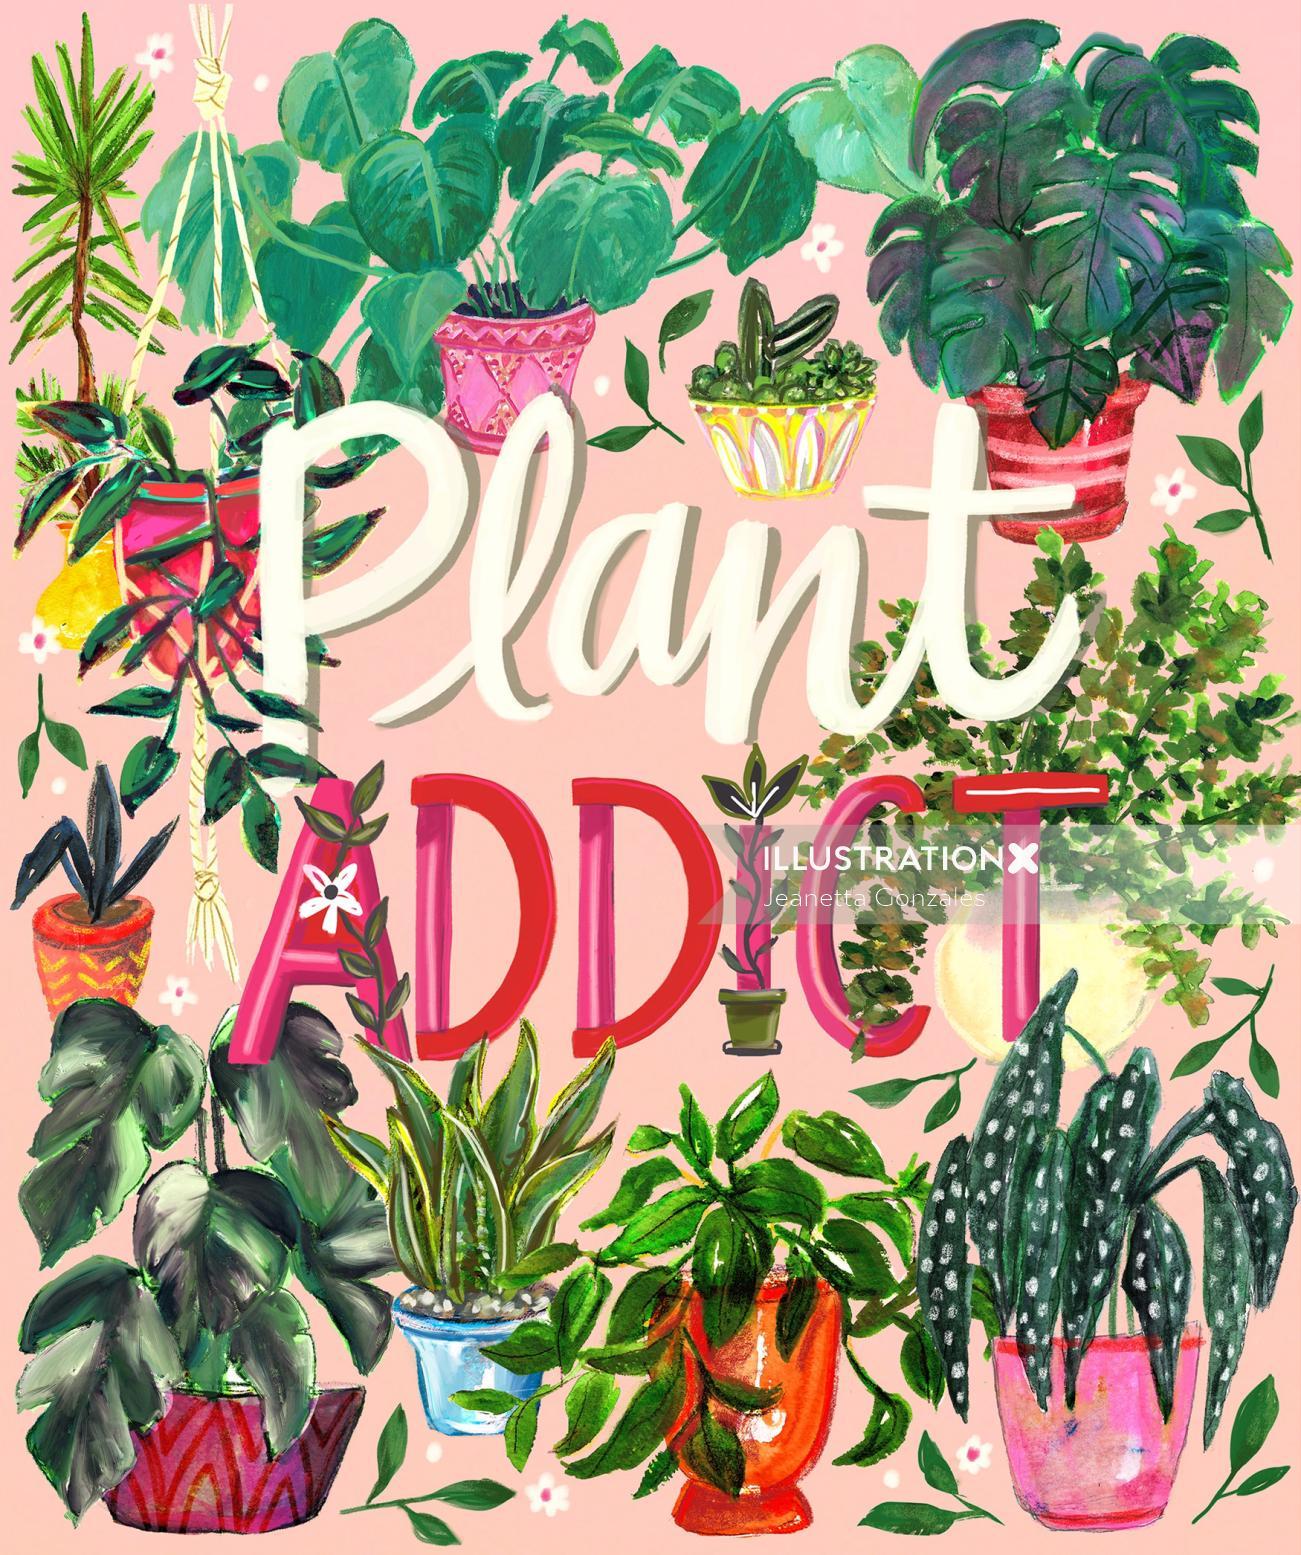 Calligraphy art of plant addict